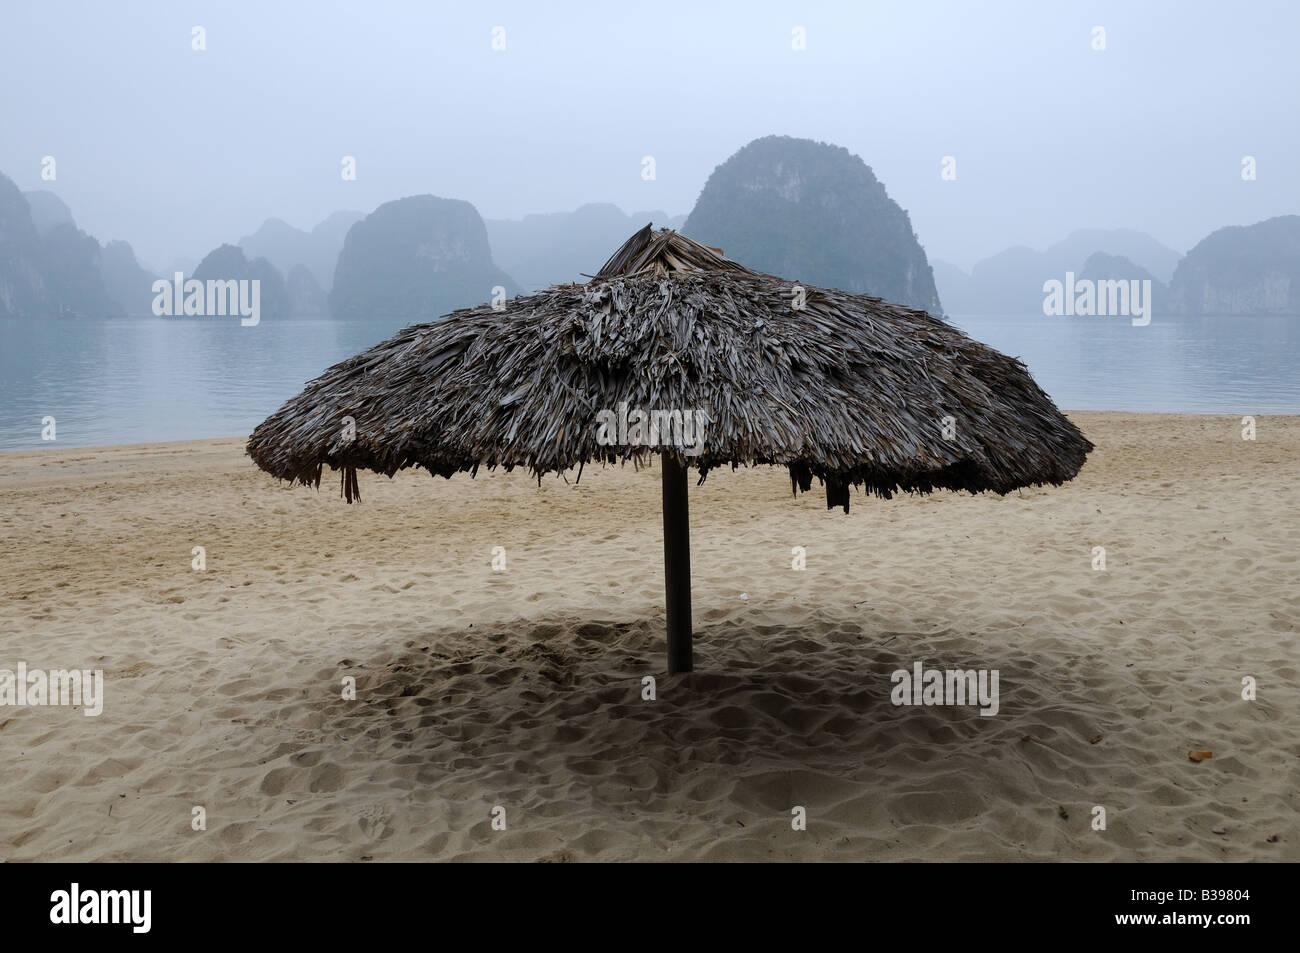 Straw umbrella on a beach misty morning Halong Bay Vietnam - Stock Image